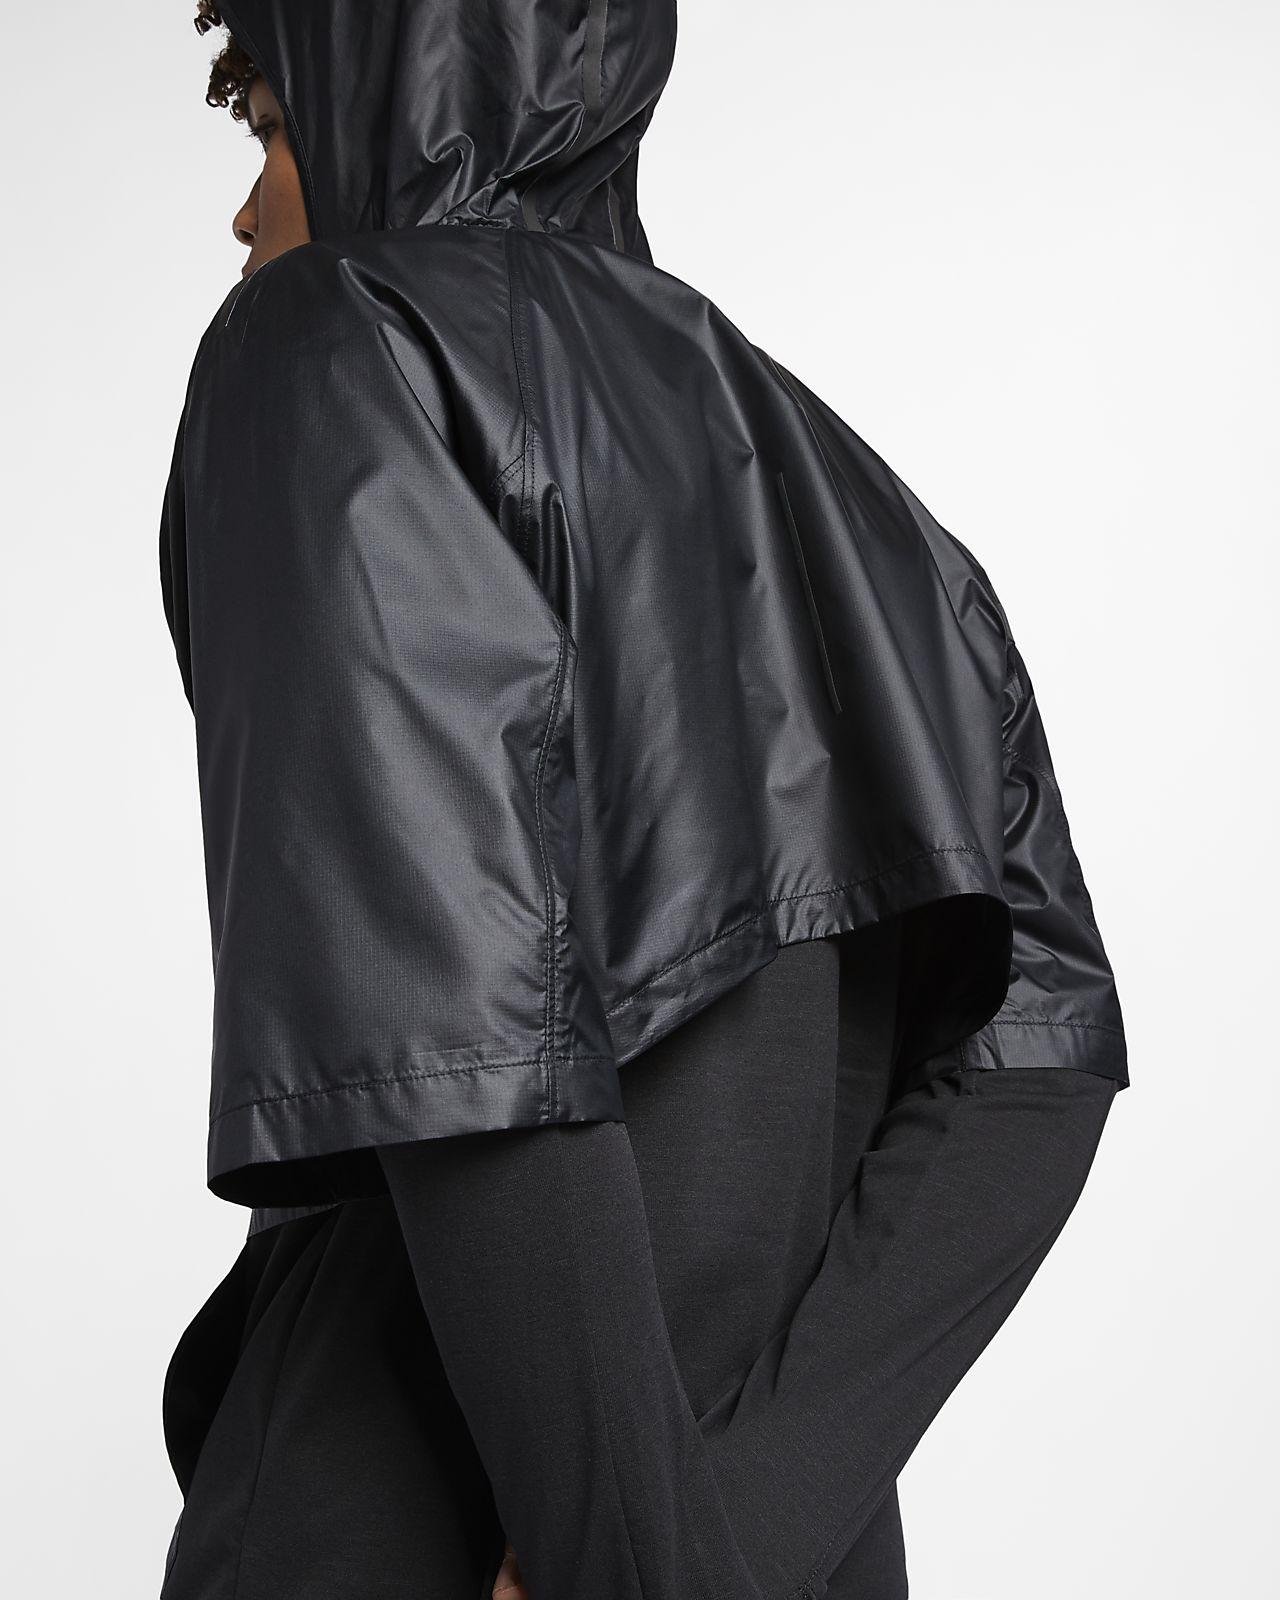 Camiseta Running Nike Sphere De Transform Hombre vN8wn0m